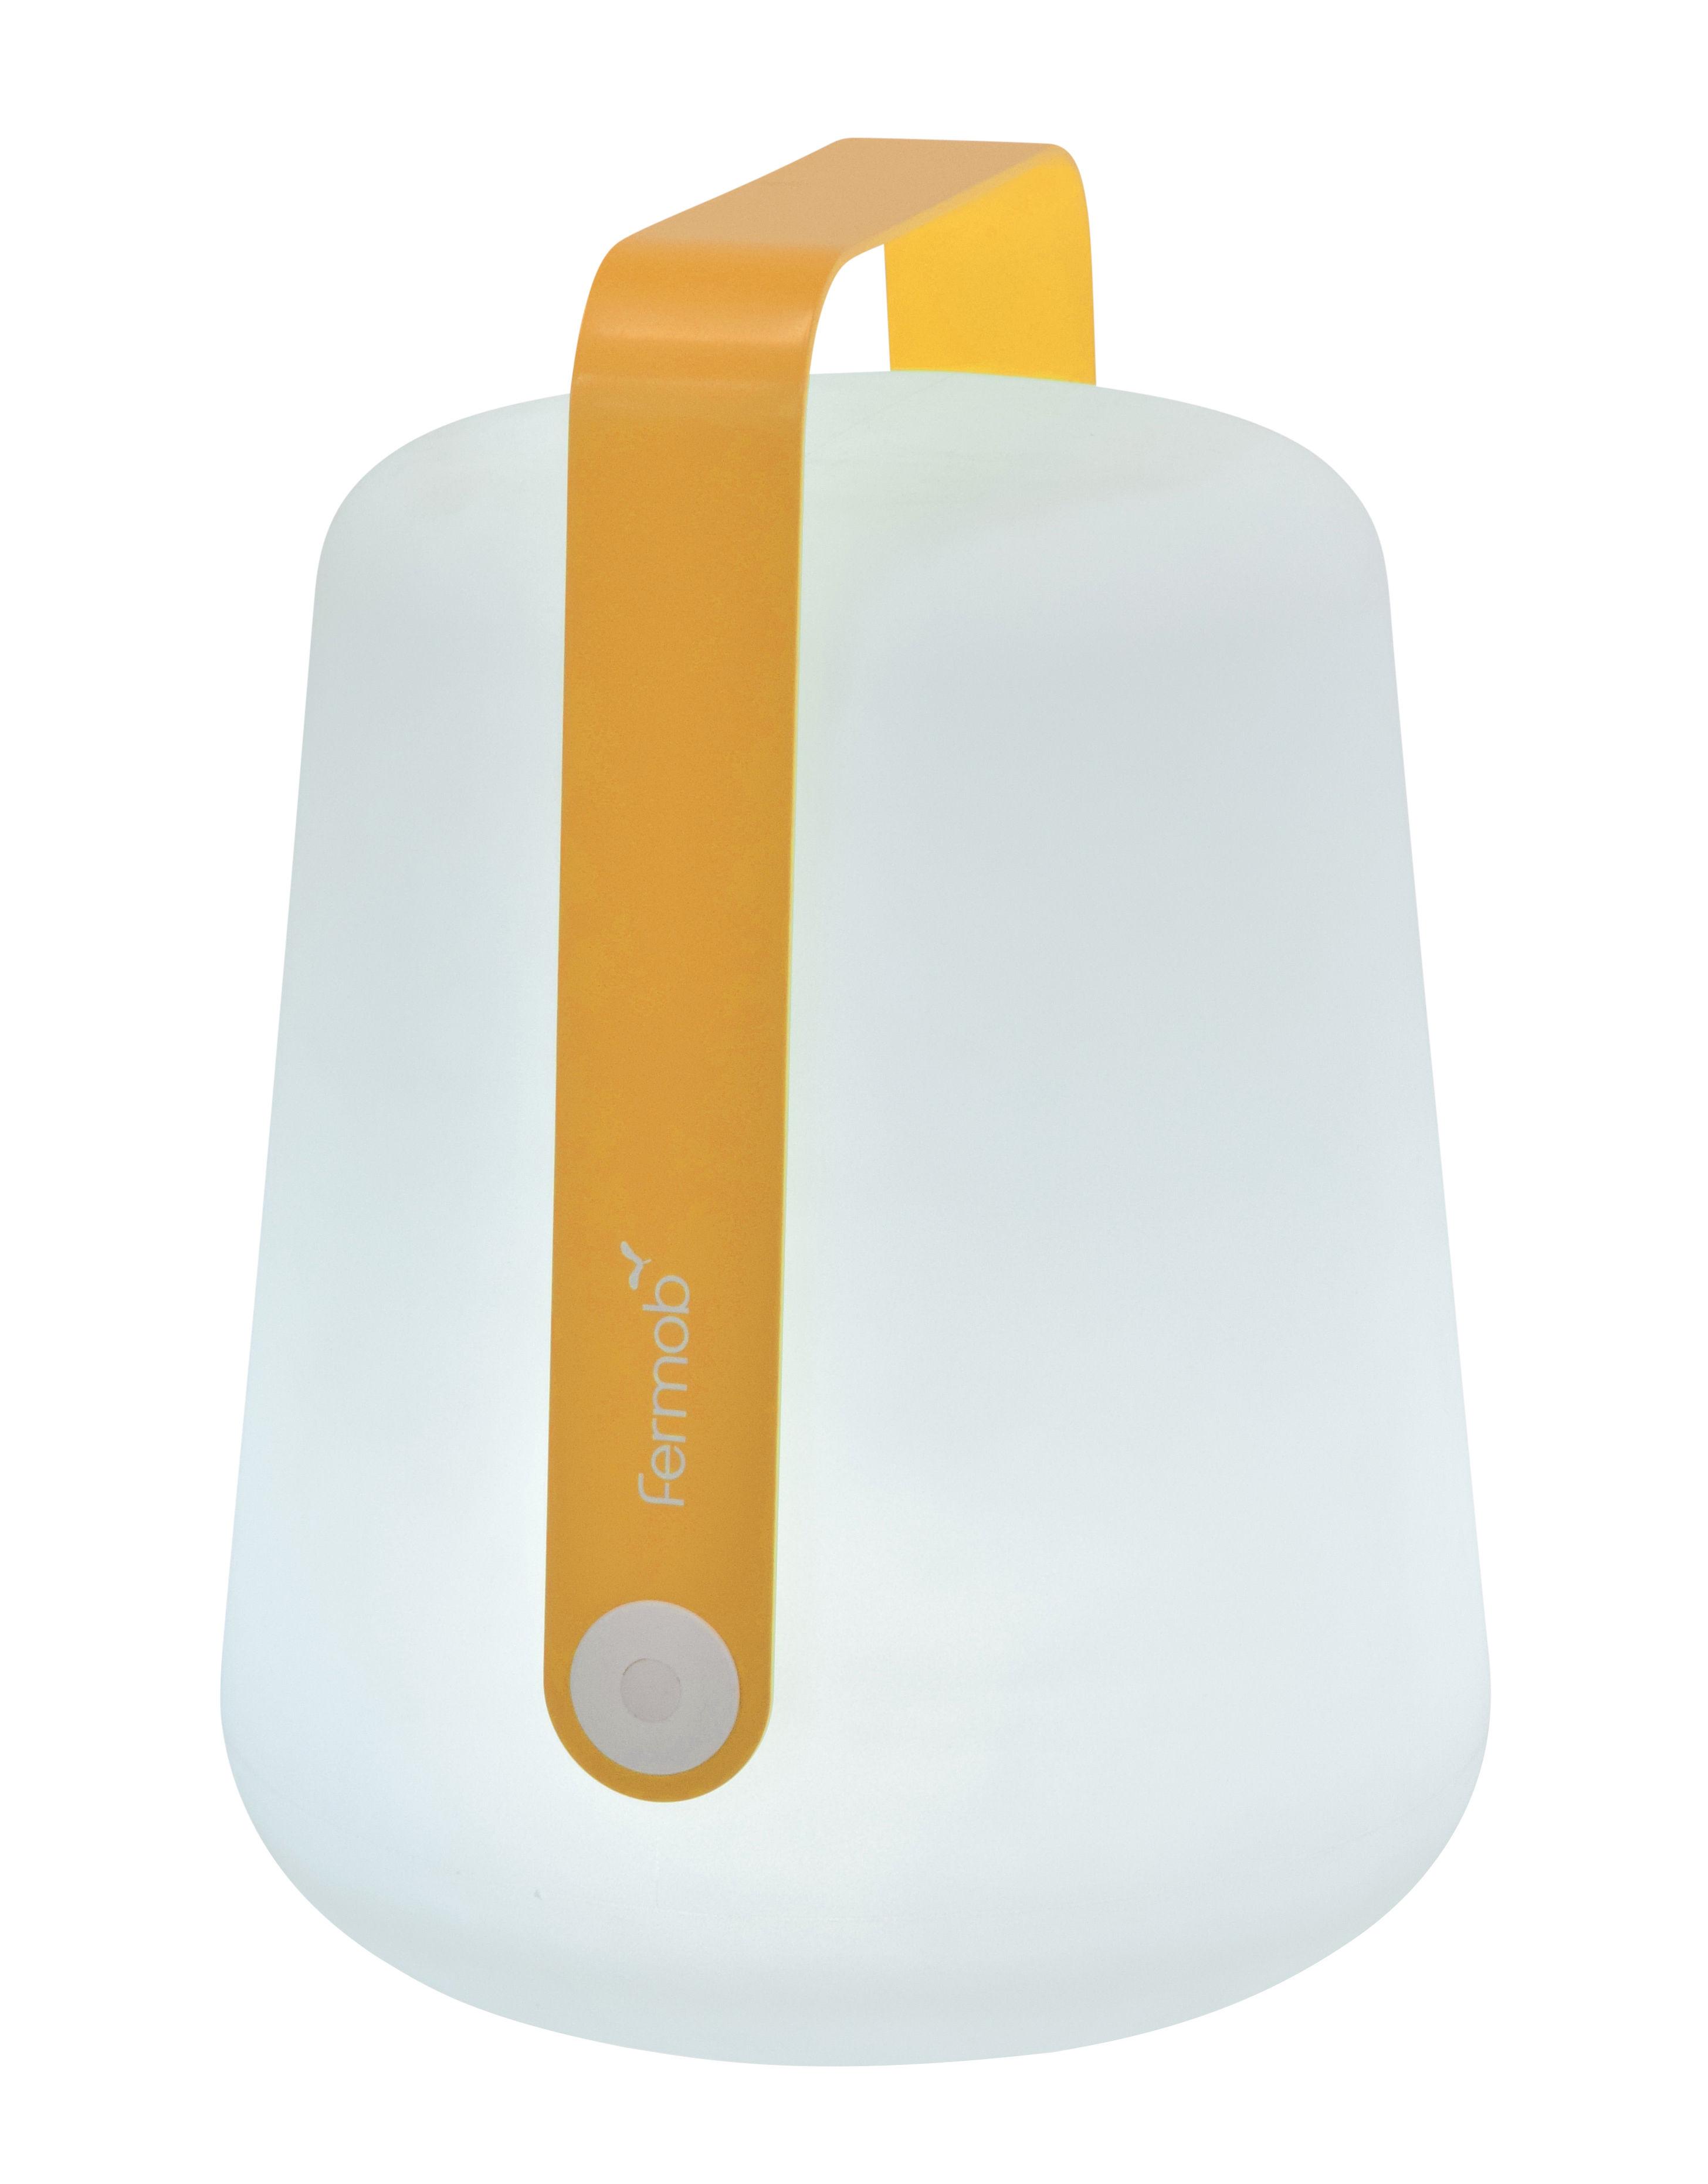 Illuminazione - Lampade da tavolo - Lampada senza fili Balad Large LED - / H 38 cm - Ricarica USB di Fermob - Miele - Alluminio, Polietilene